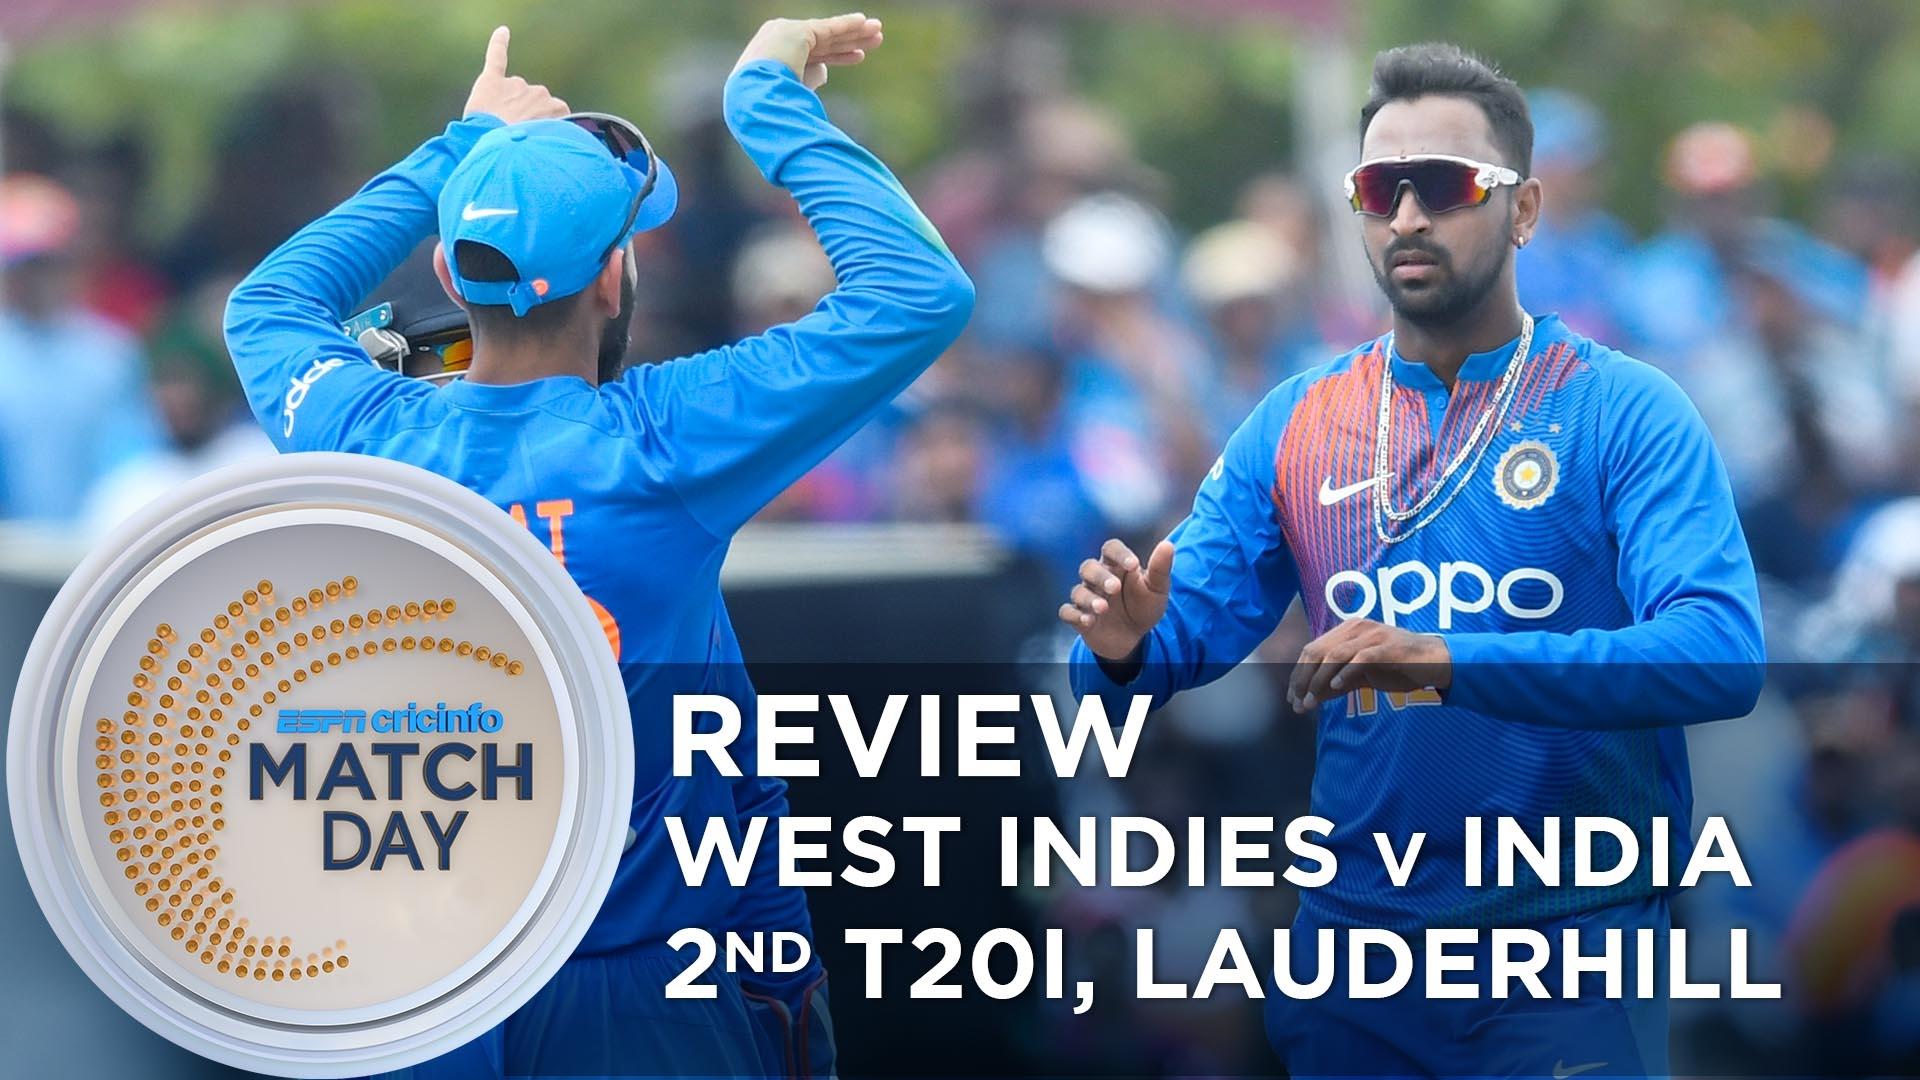 Full Scorecard Of India Vs West Indies 2nd T20i 2019 Score